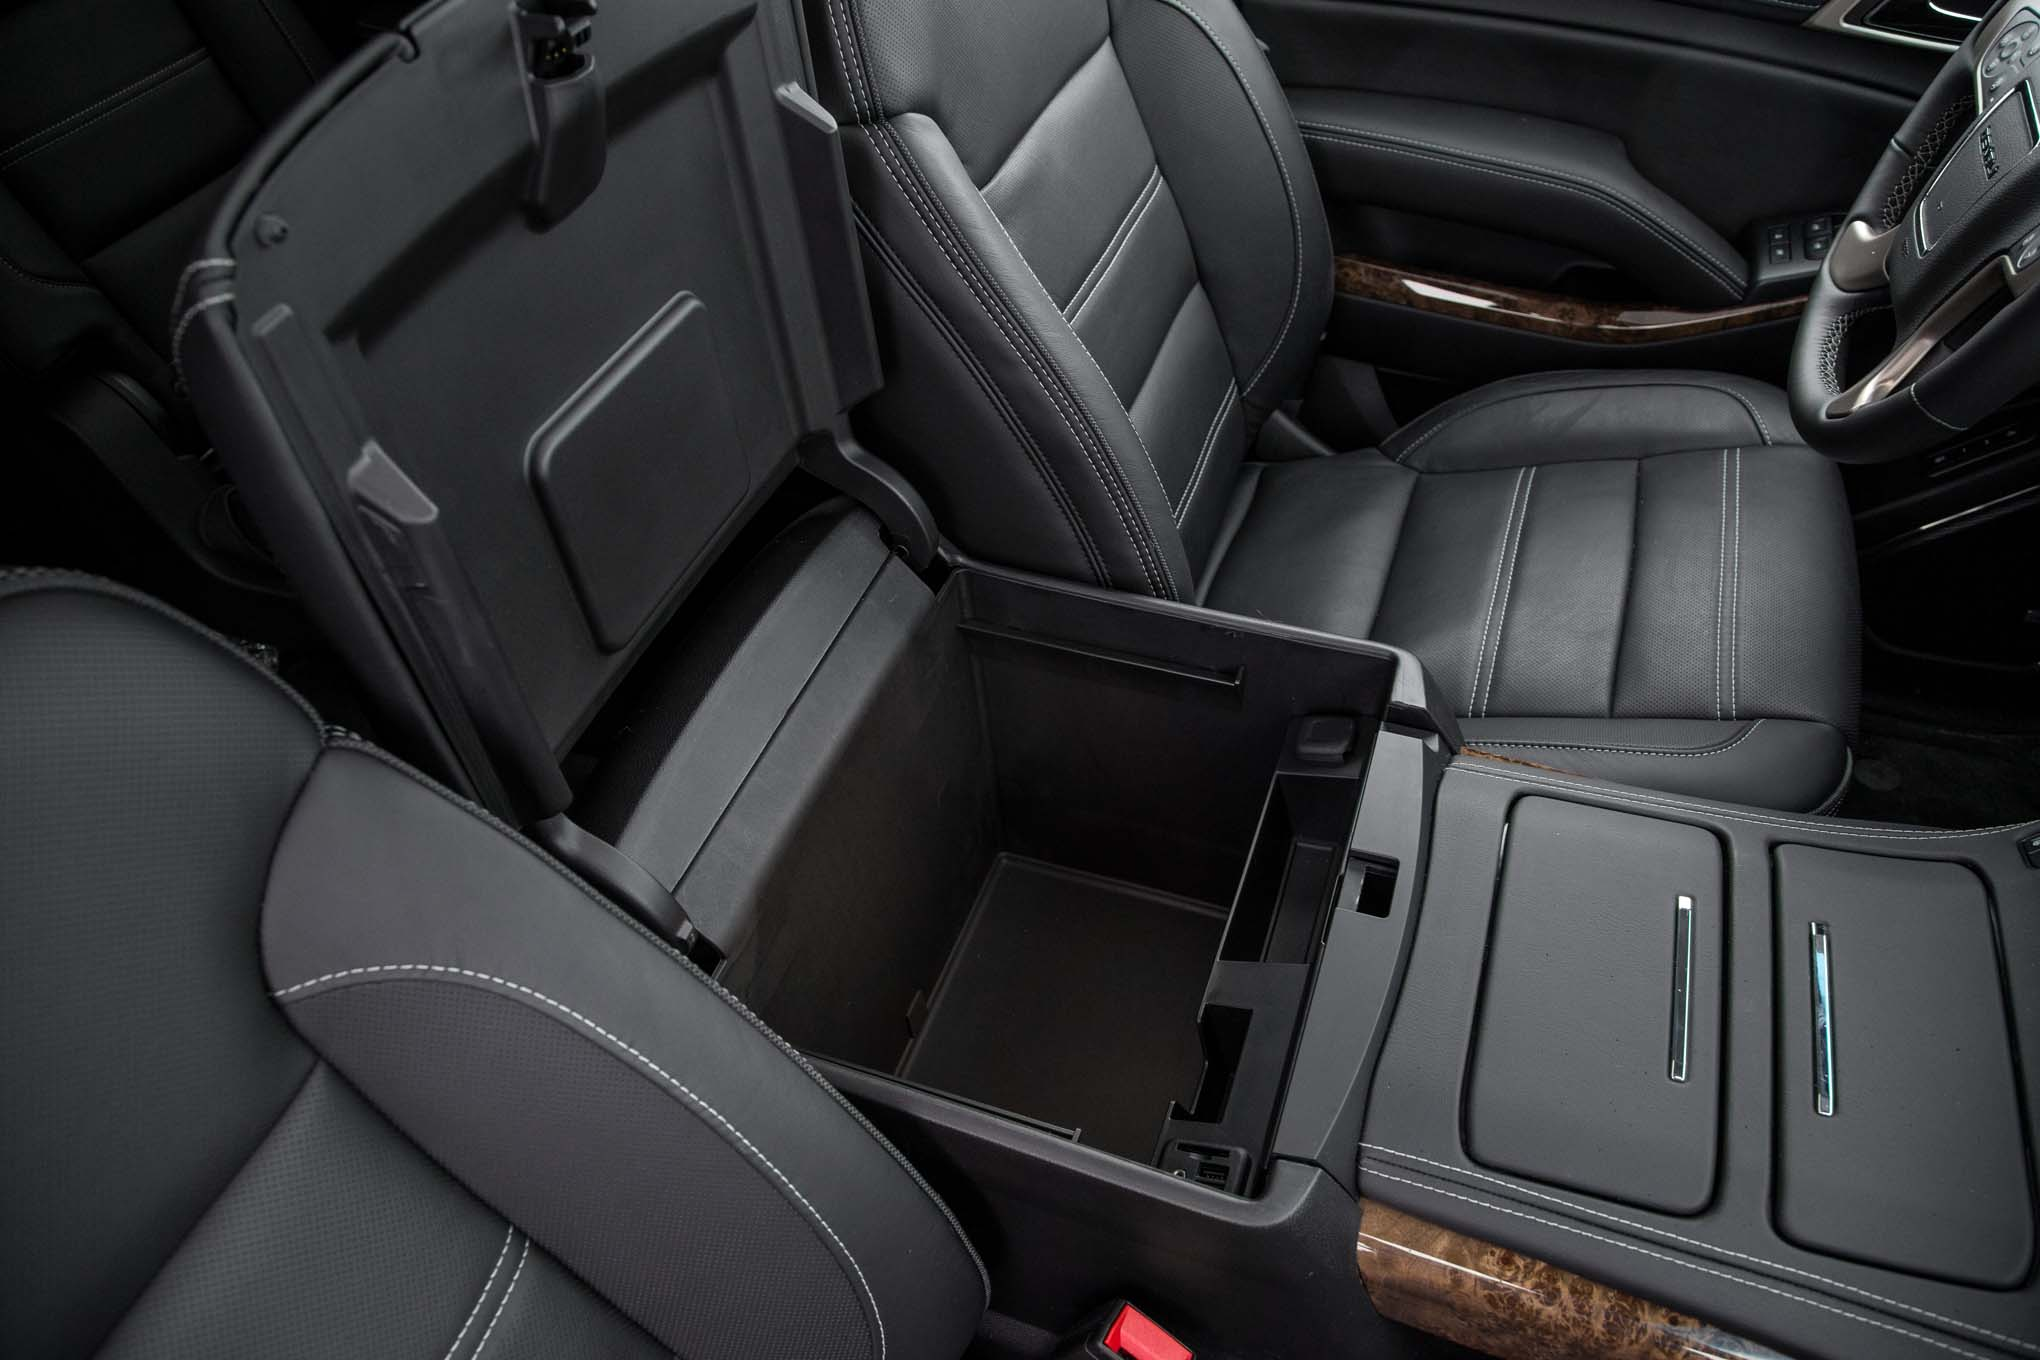 2015 GMC Yukon XL Front Console